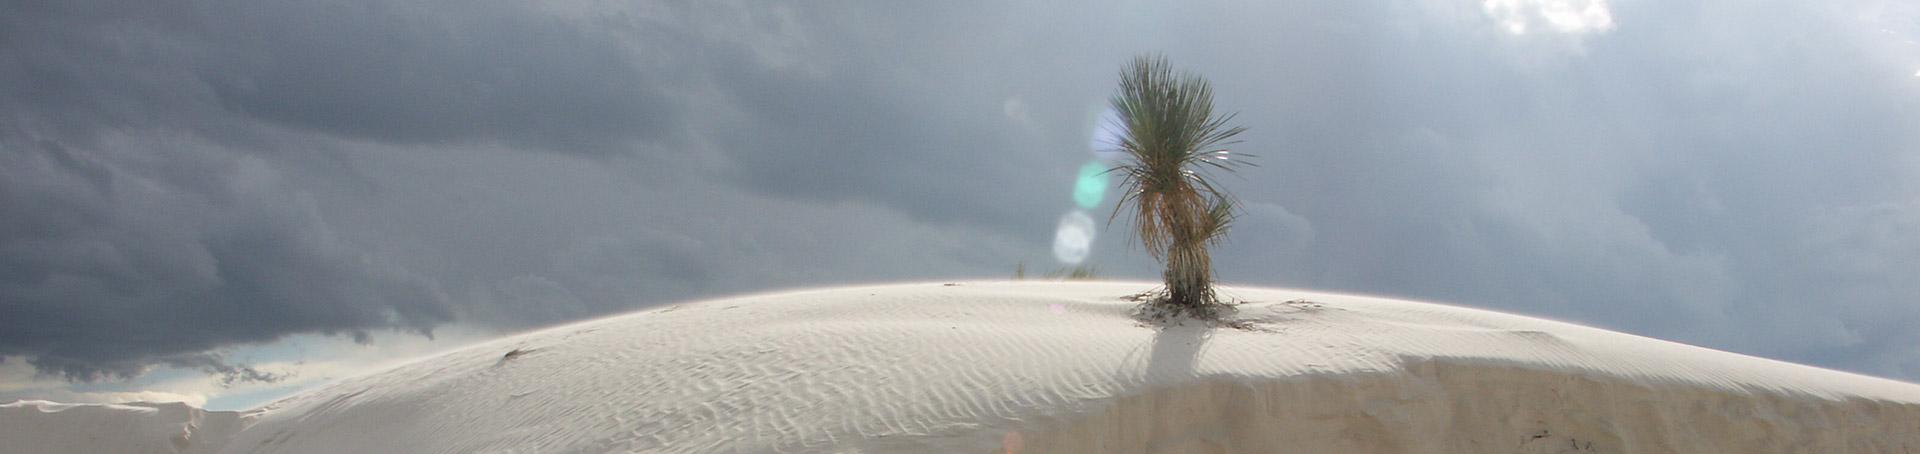 Tordenvejr,White Sands National Monument,Palme,New Mexico